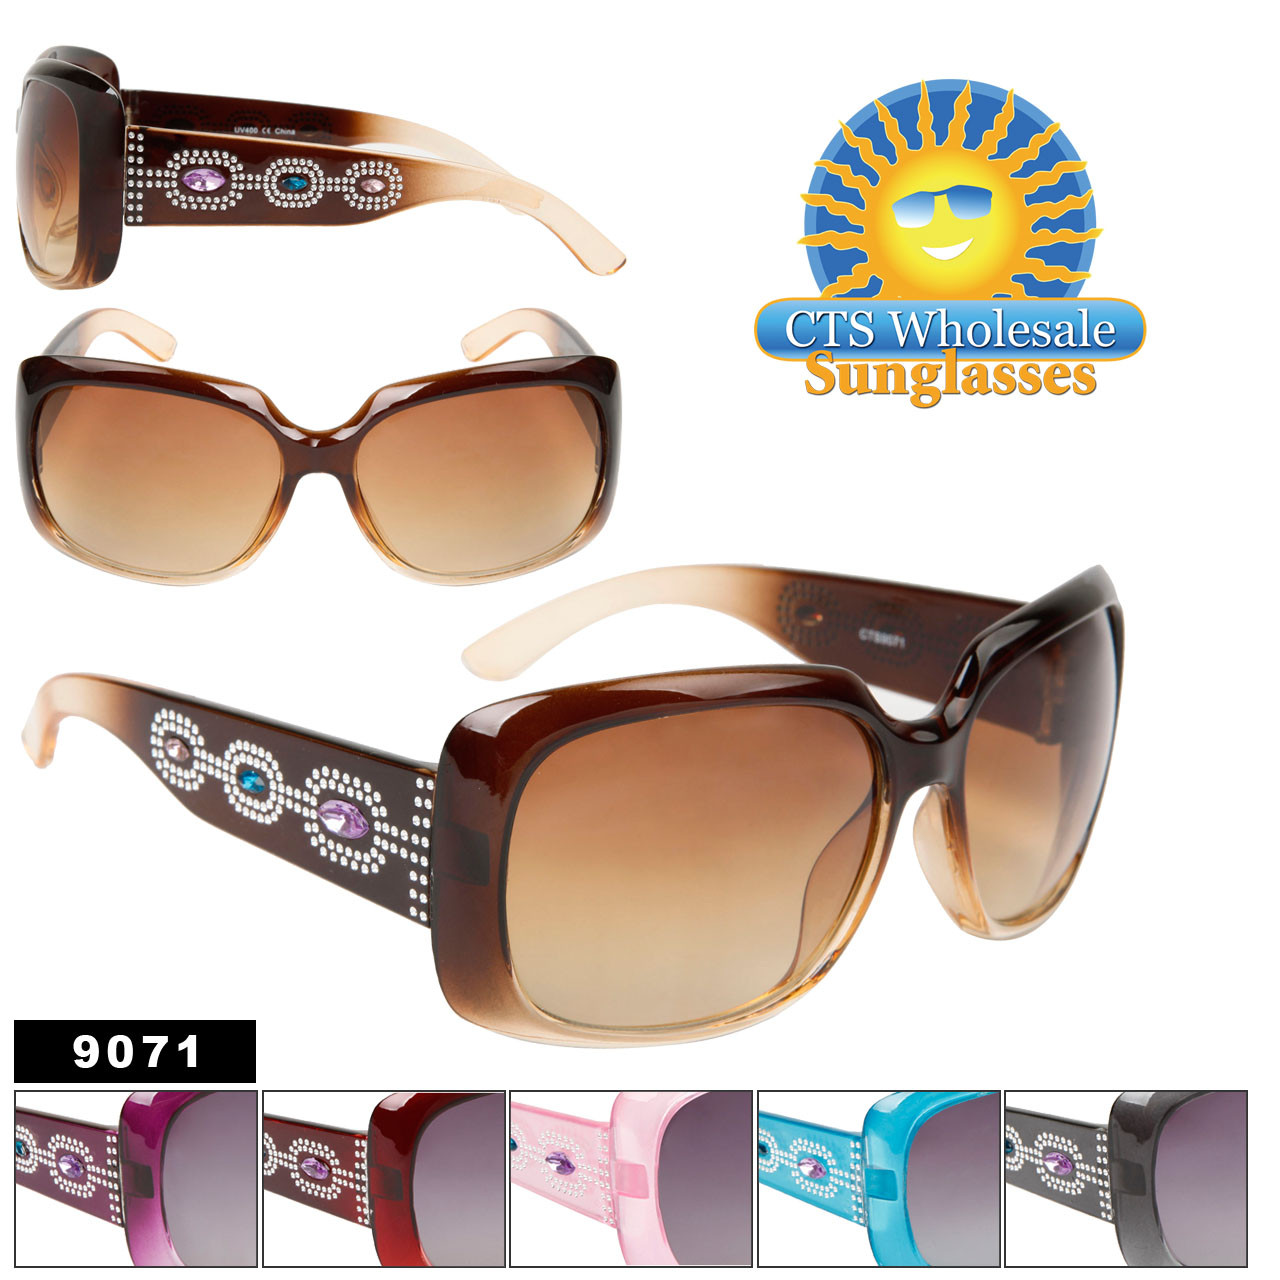 Women's Wholesale Sunglasses